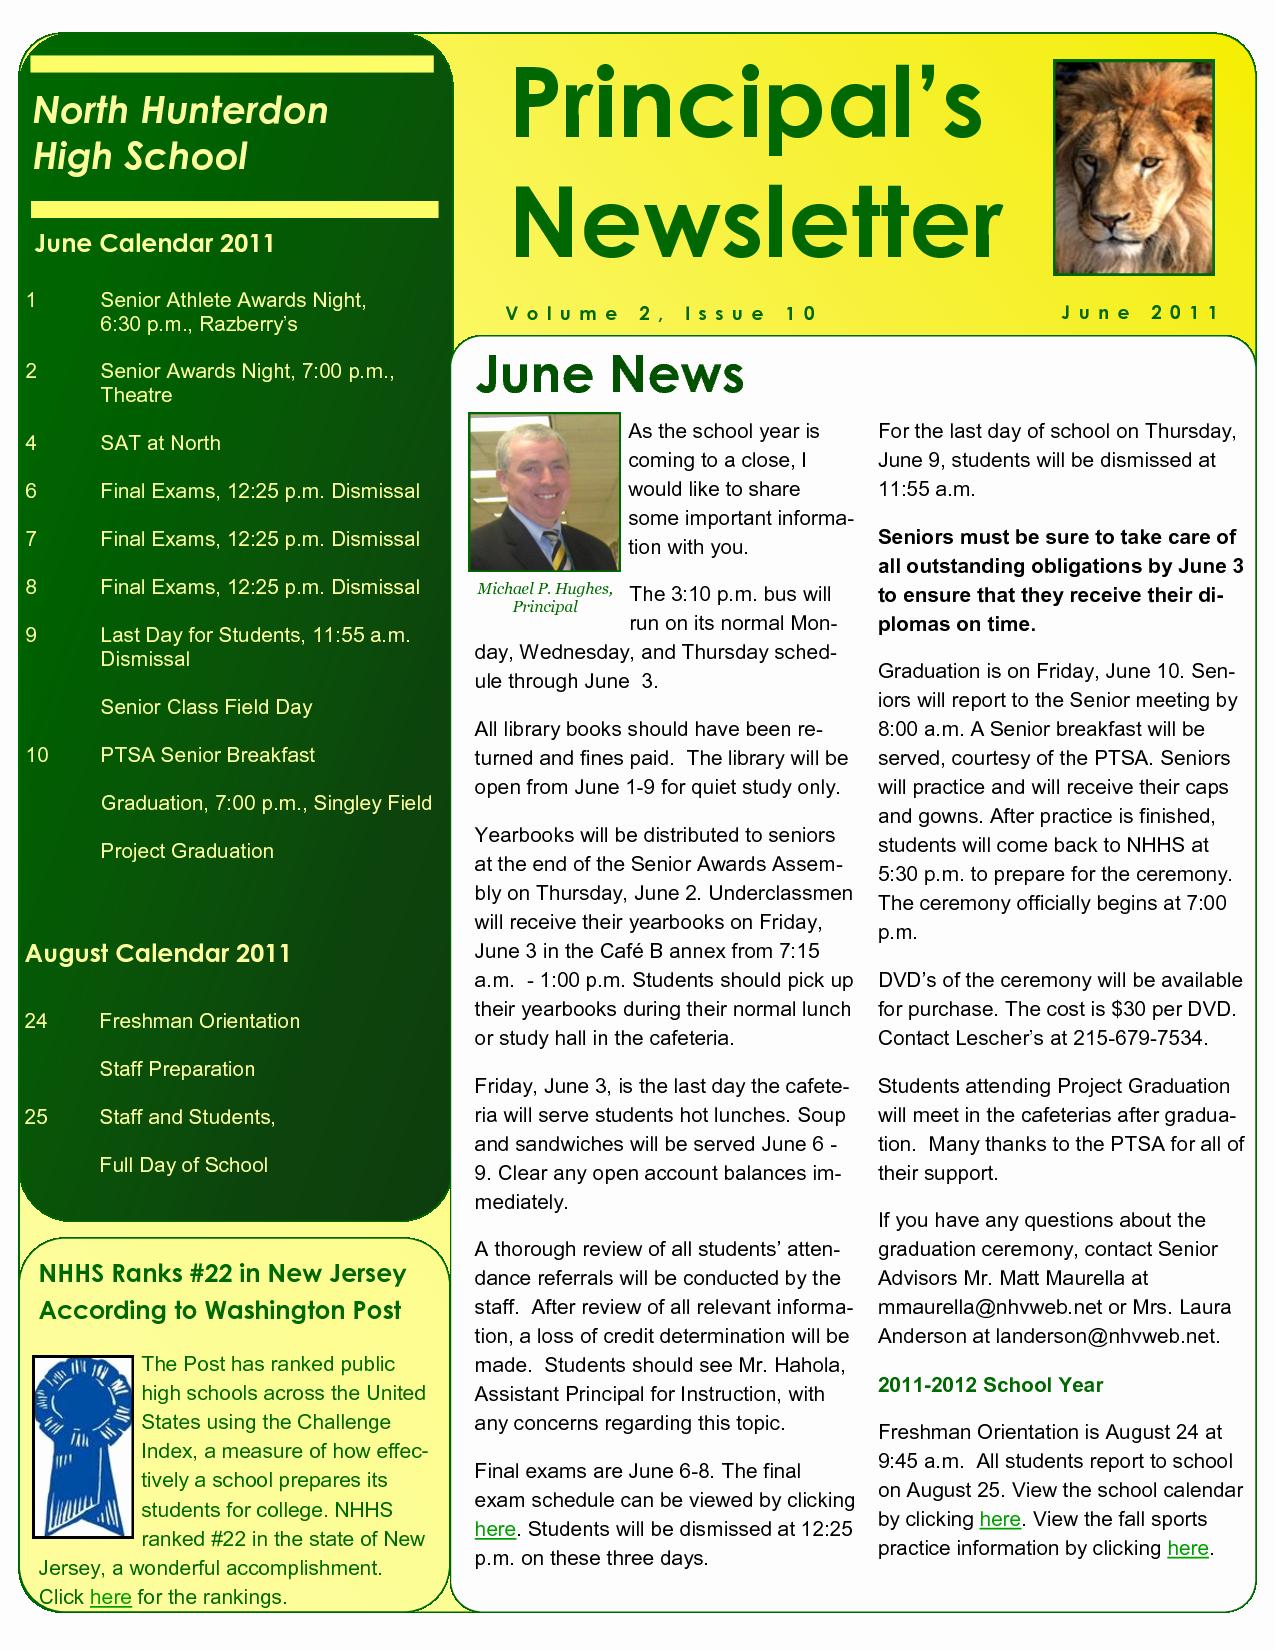 School Newsletter Templates Free Luxury Best S Of Sample School Newsletter Templates Free